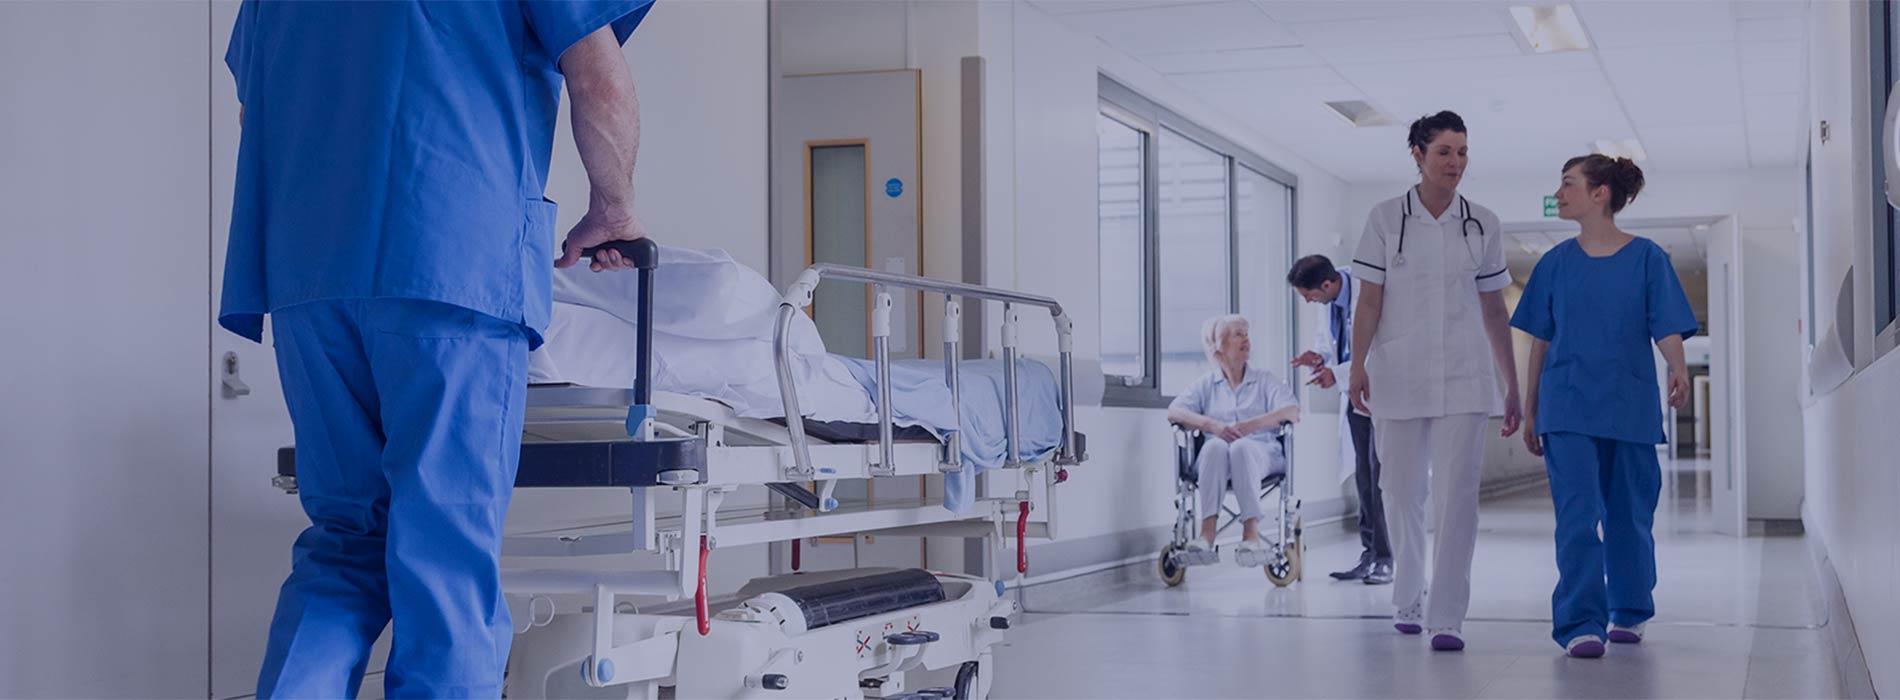 Hospital with nurses